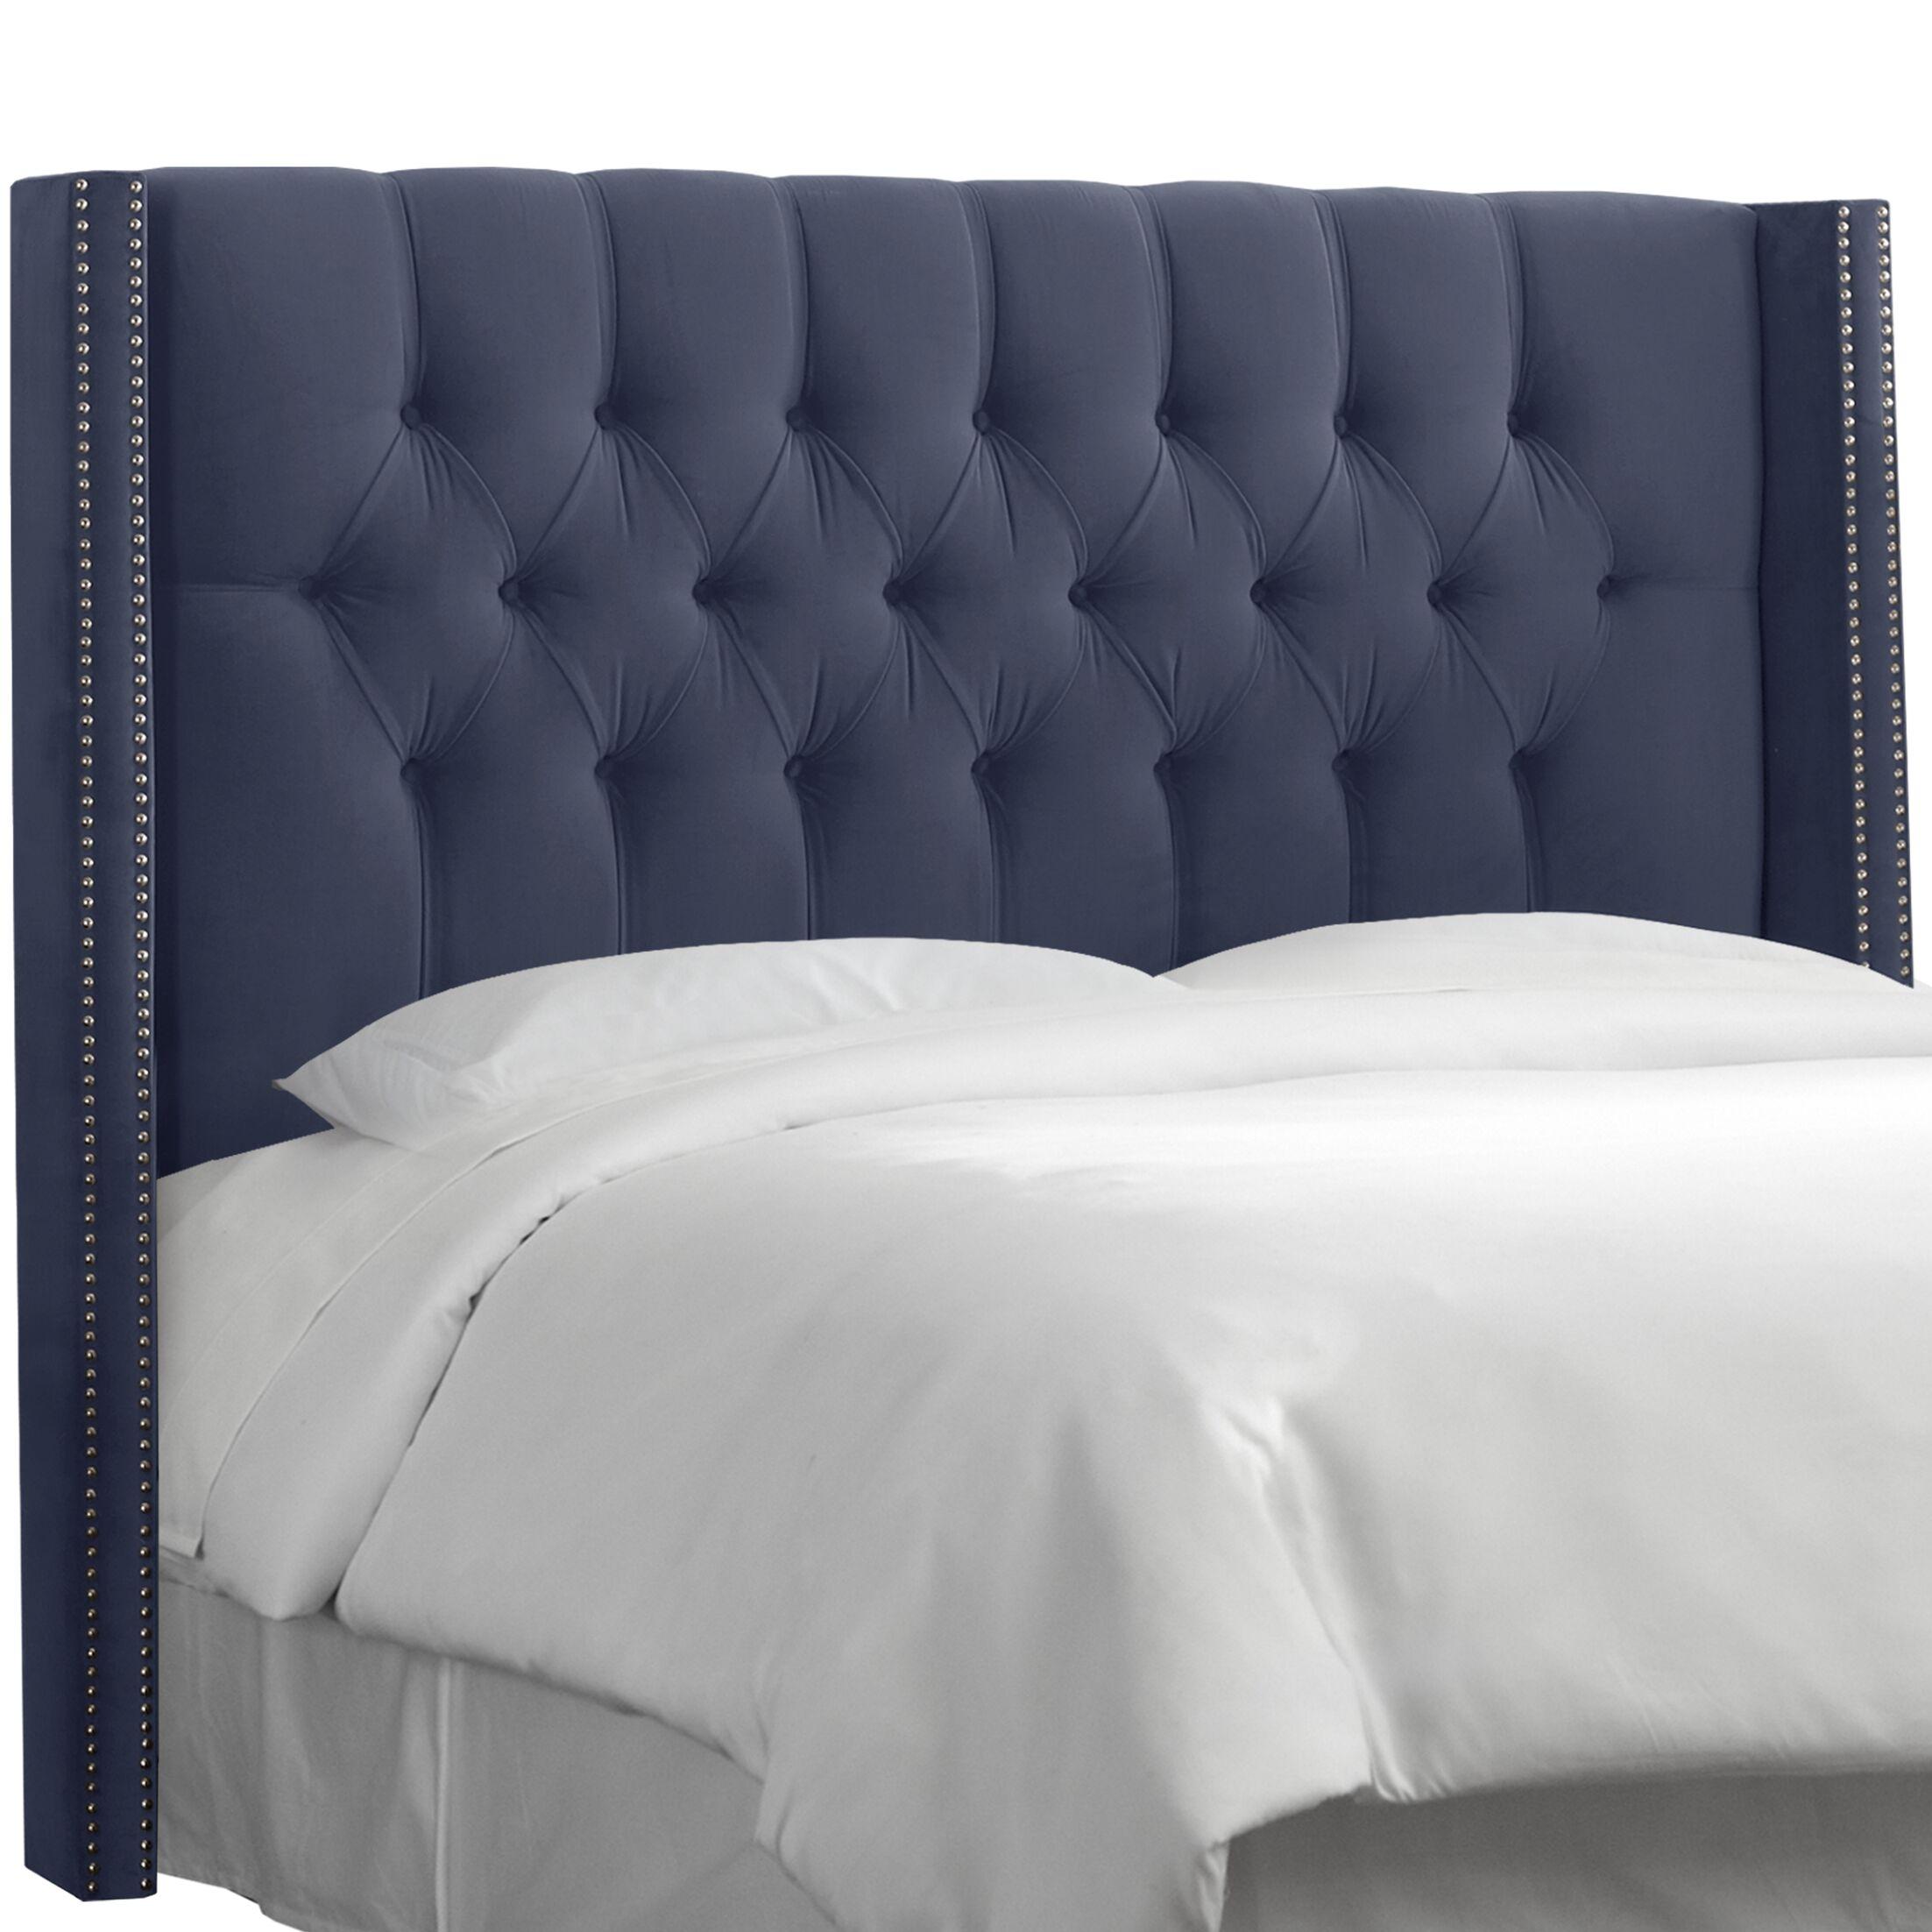 Aura Traditional Diamond Tufted Upholstered Wingback Headboard Size: Full, Upholstery: Regal Ocean